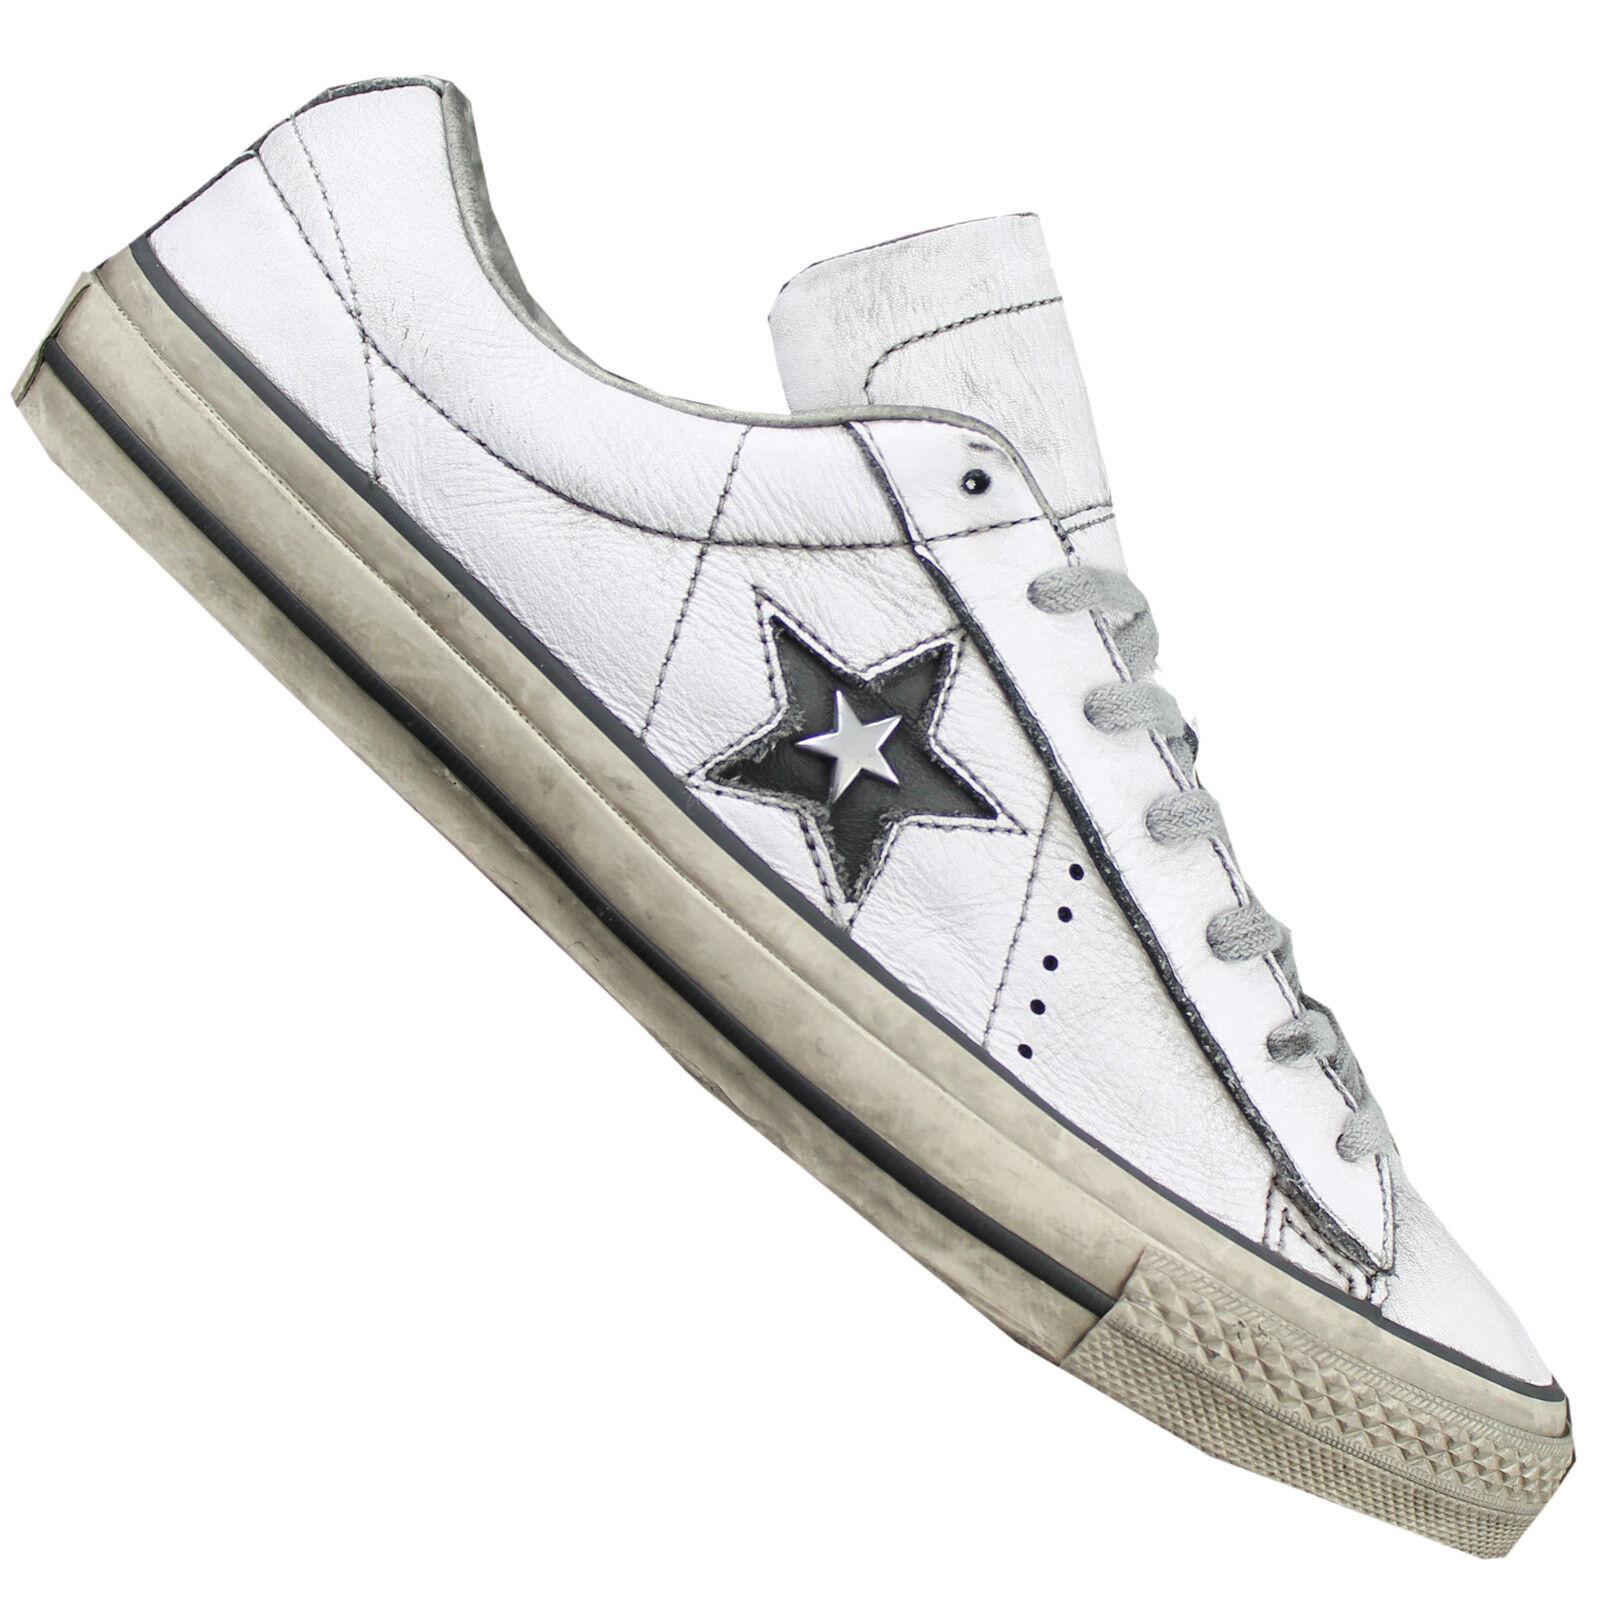 Converse One Star OX Damen Sneaker Turnschuhe Schuhe Distressed Distressed Distressed Leder NEU 61a0ff